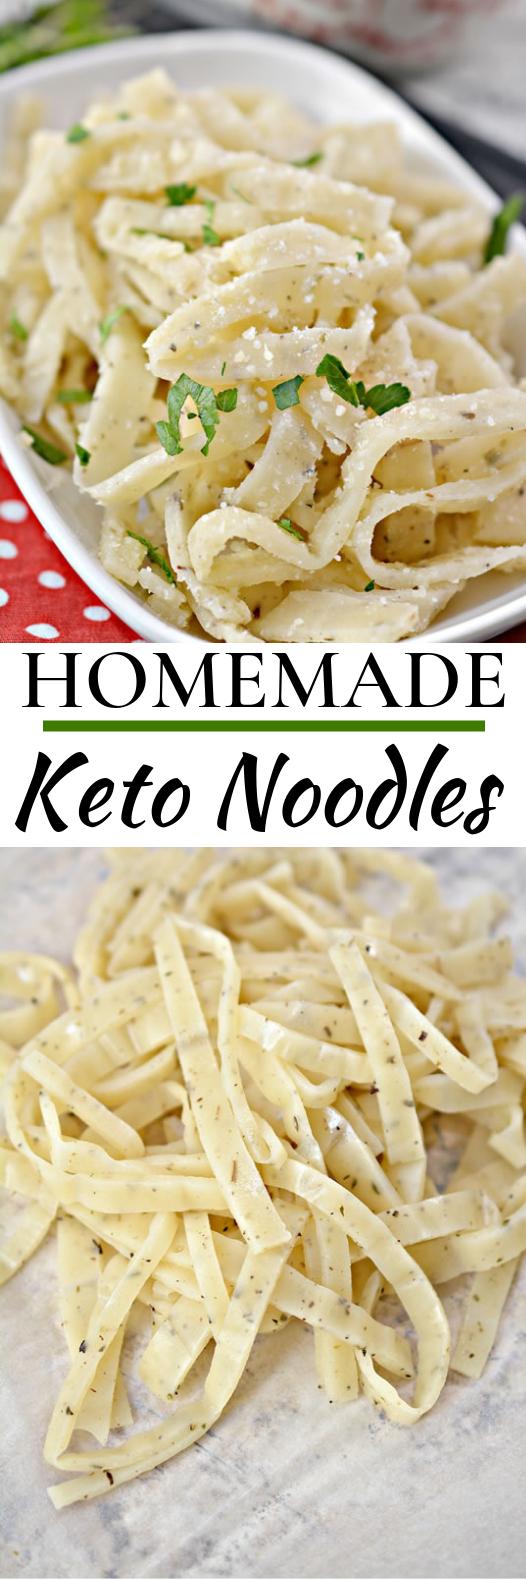 Homemade Keto Noodles #keto #glutenfree